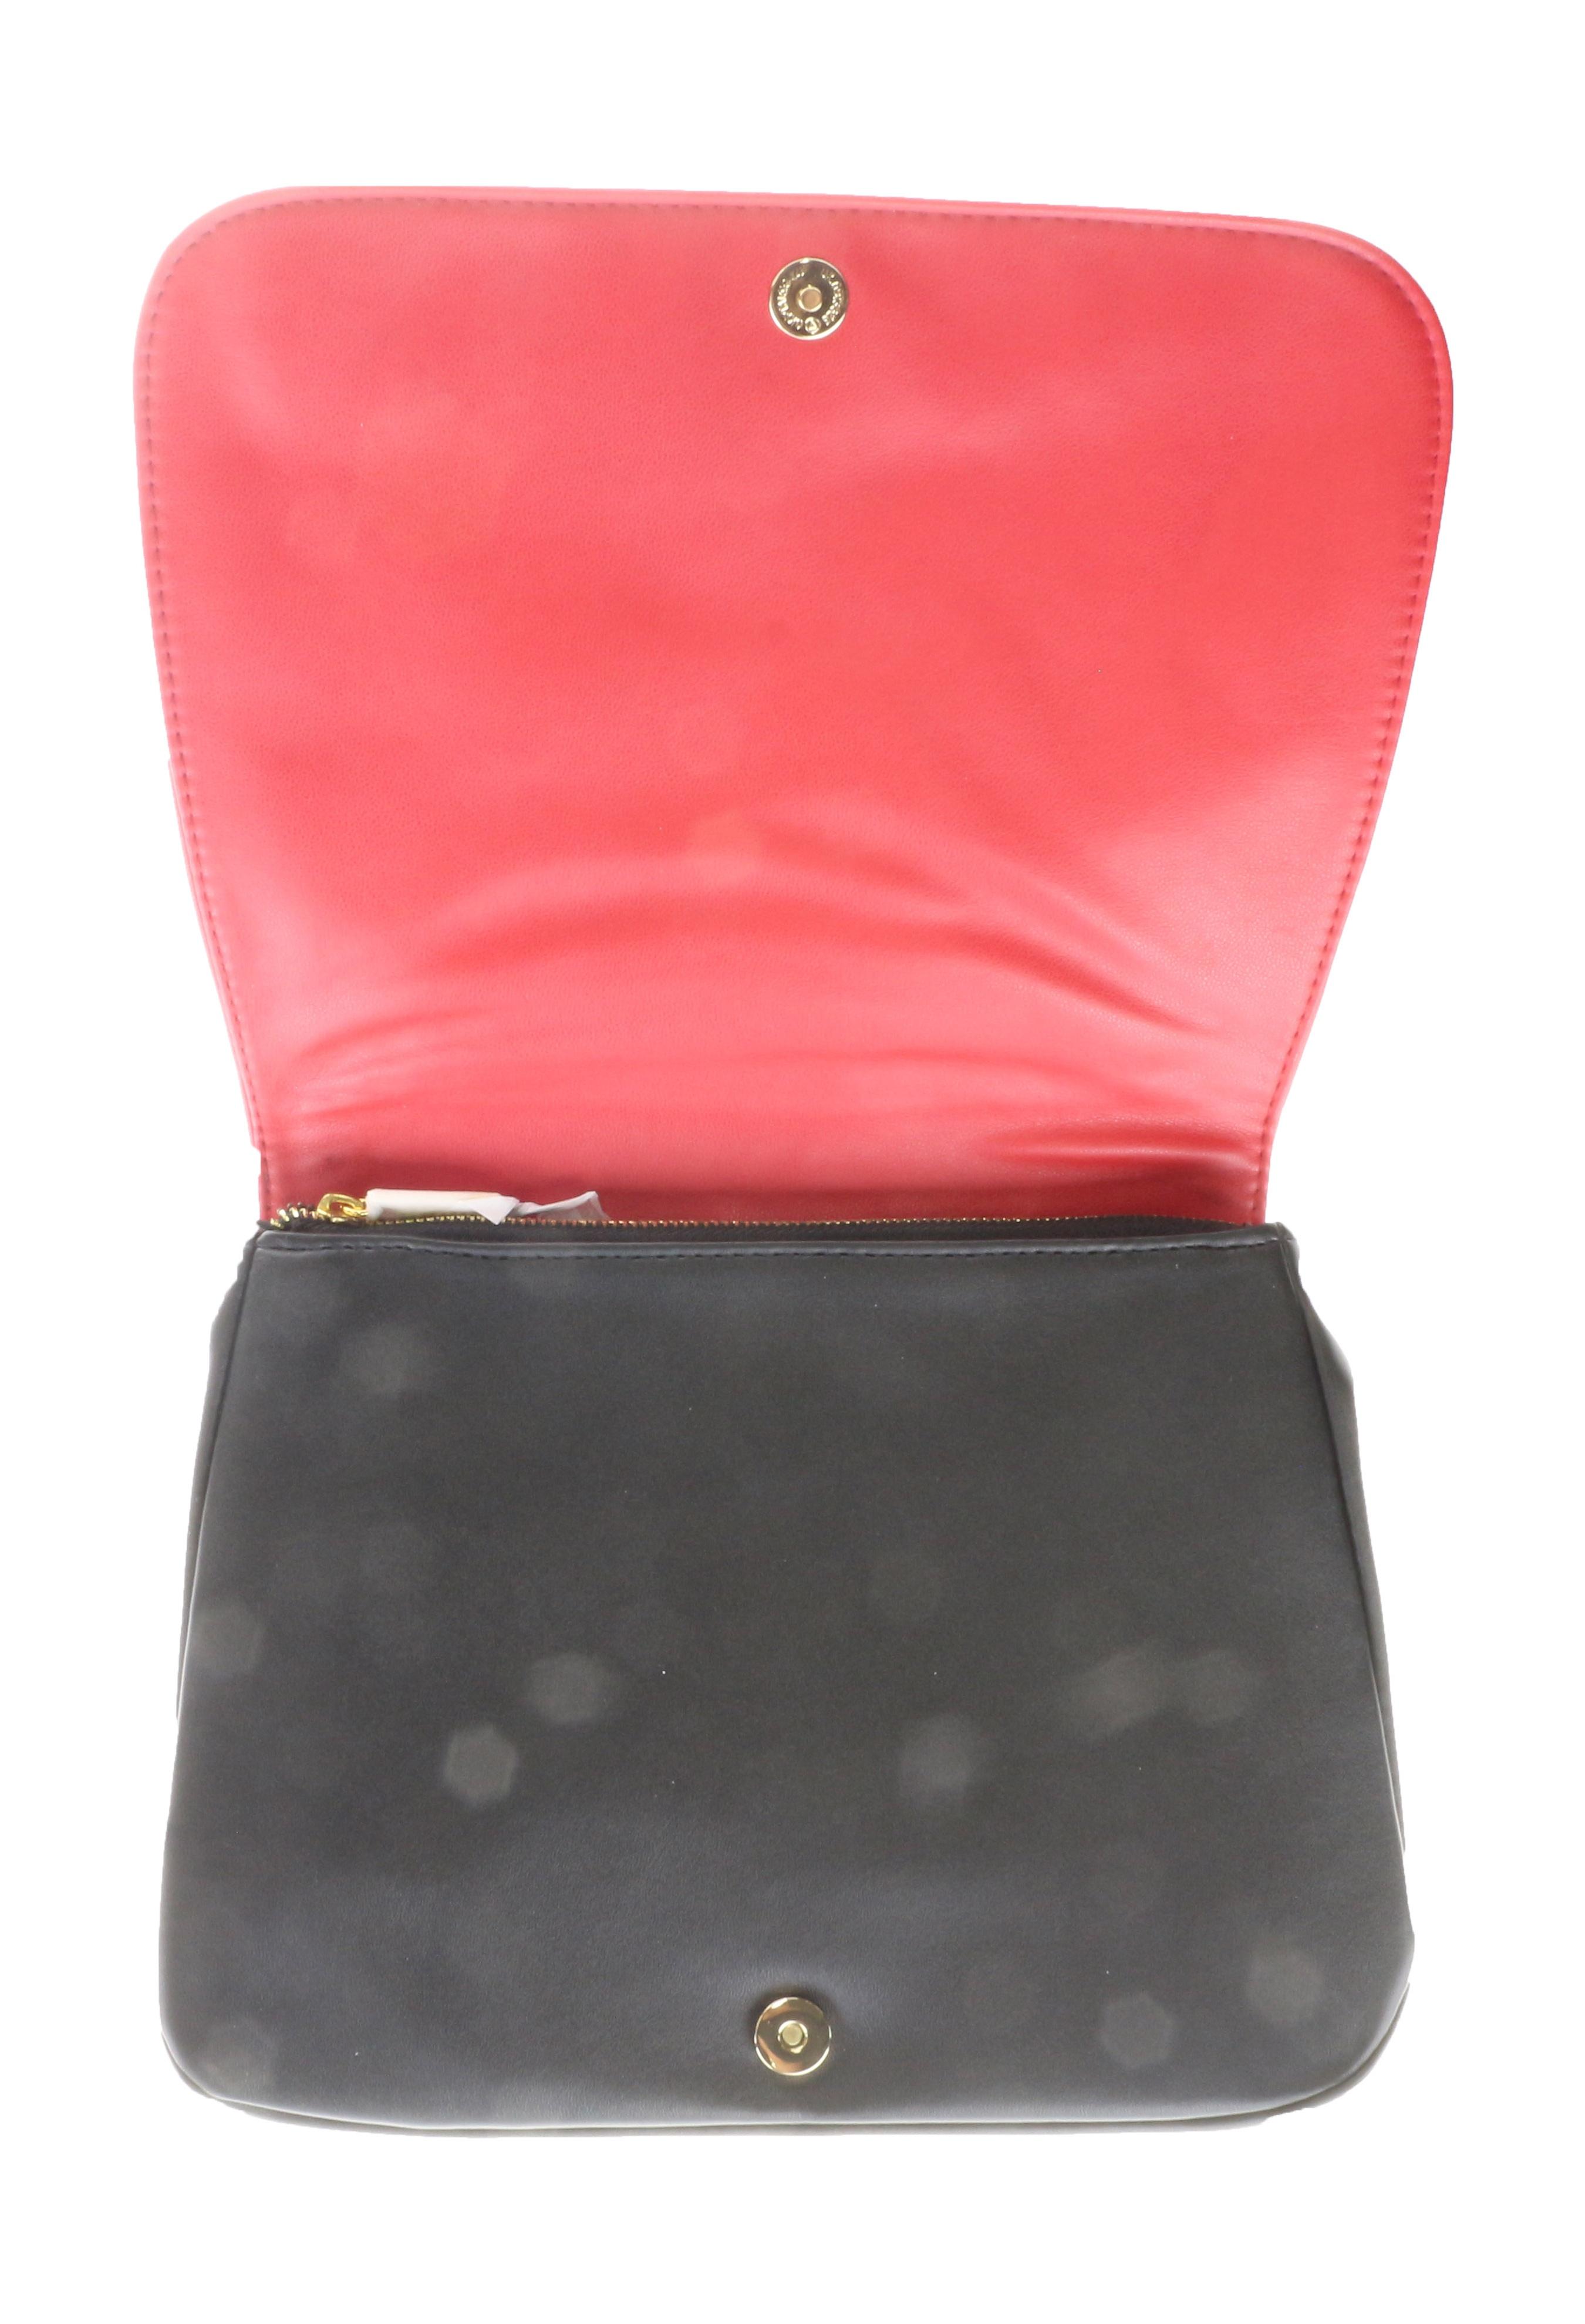 e2a2d08e3a Fan Di Fendi L Acquarossa Red Black Faux Leather Trousse Pouch (9